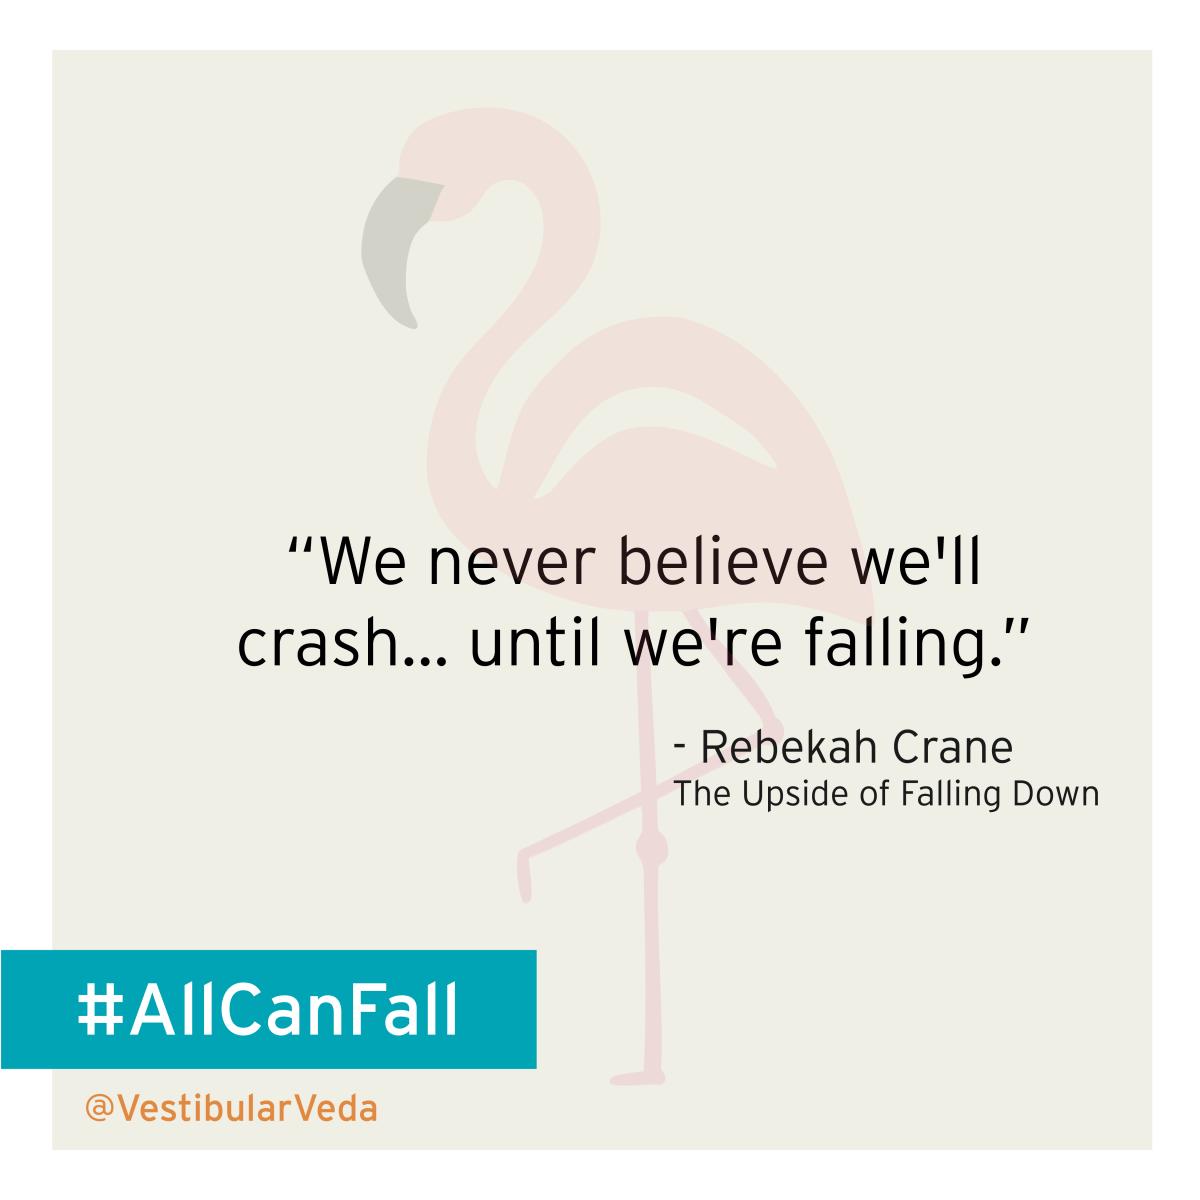 """We never believe we'll crash... until we're falling.""  ― Rebekah Crane, The Upside of Falling Down"